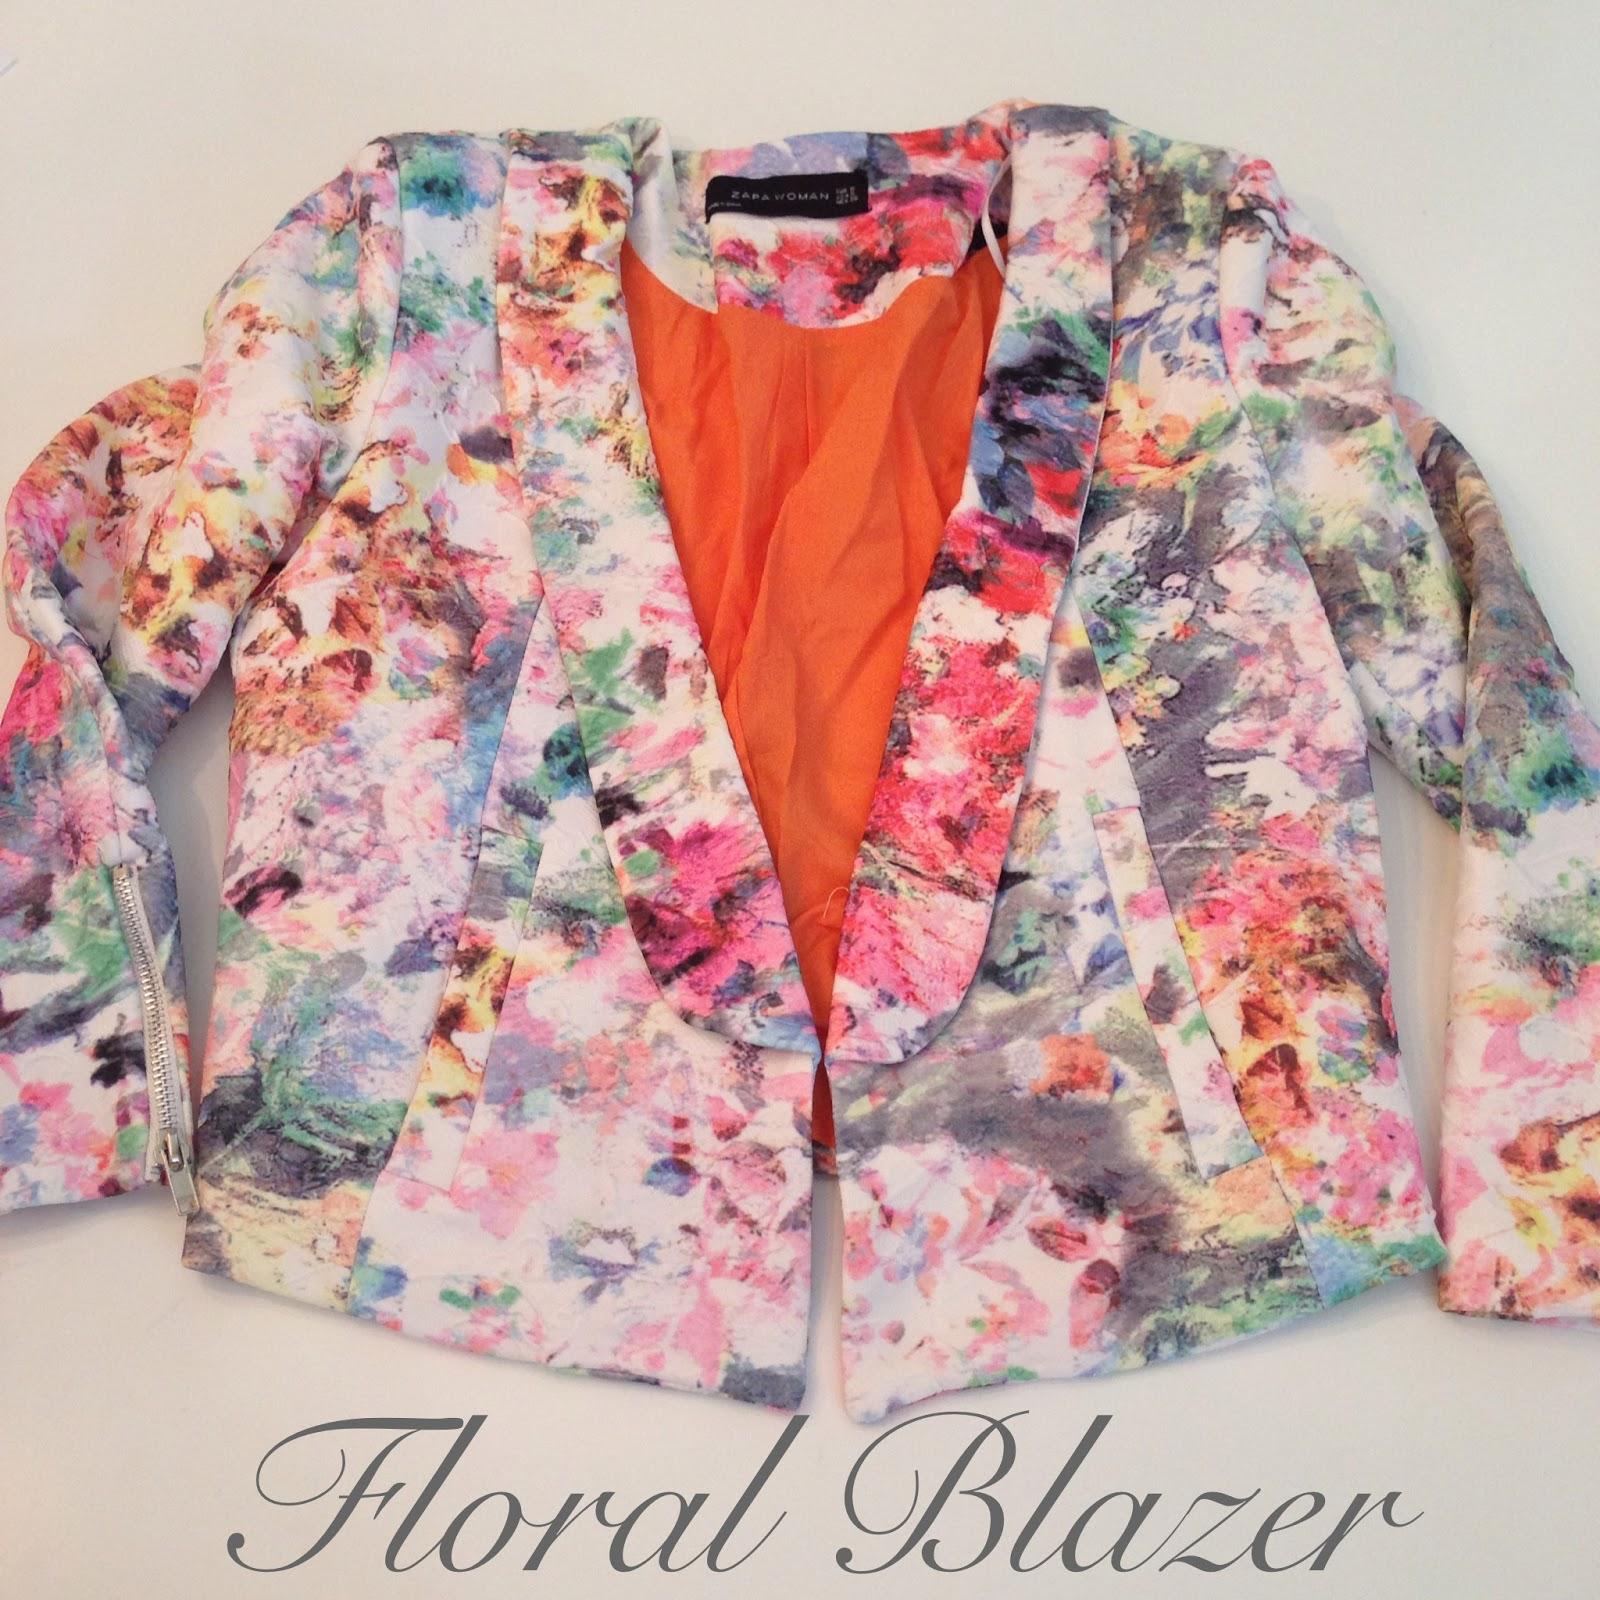 http://www.chicnova.com/ol-lapel-floral-printed-blazer.html?SSAID=687298